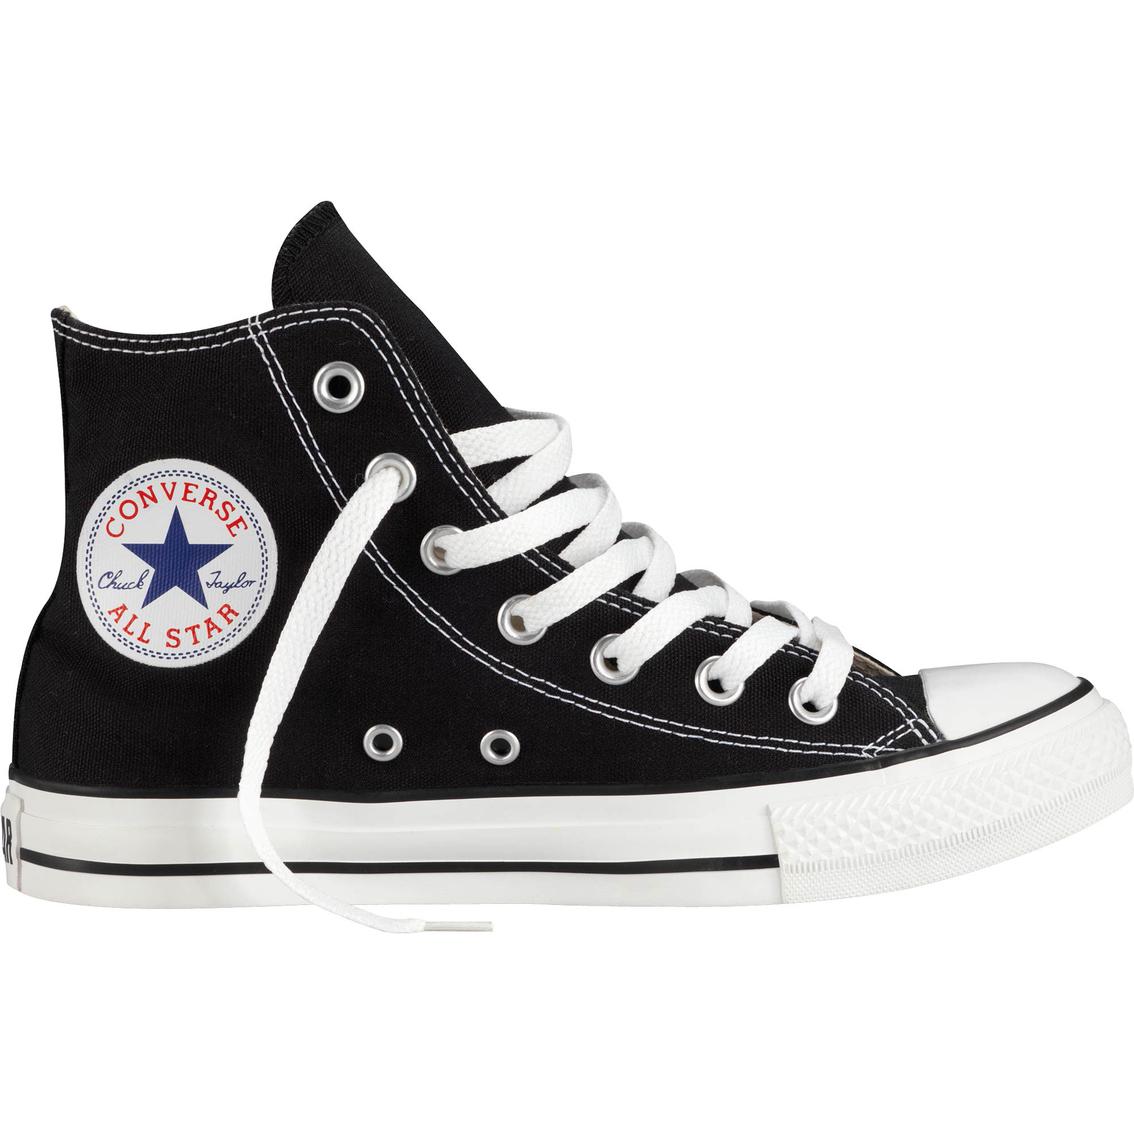 Converse Men s Chuck Taylor All Star Hi Sneakers  82b79e30da5f